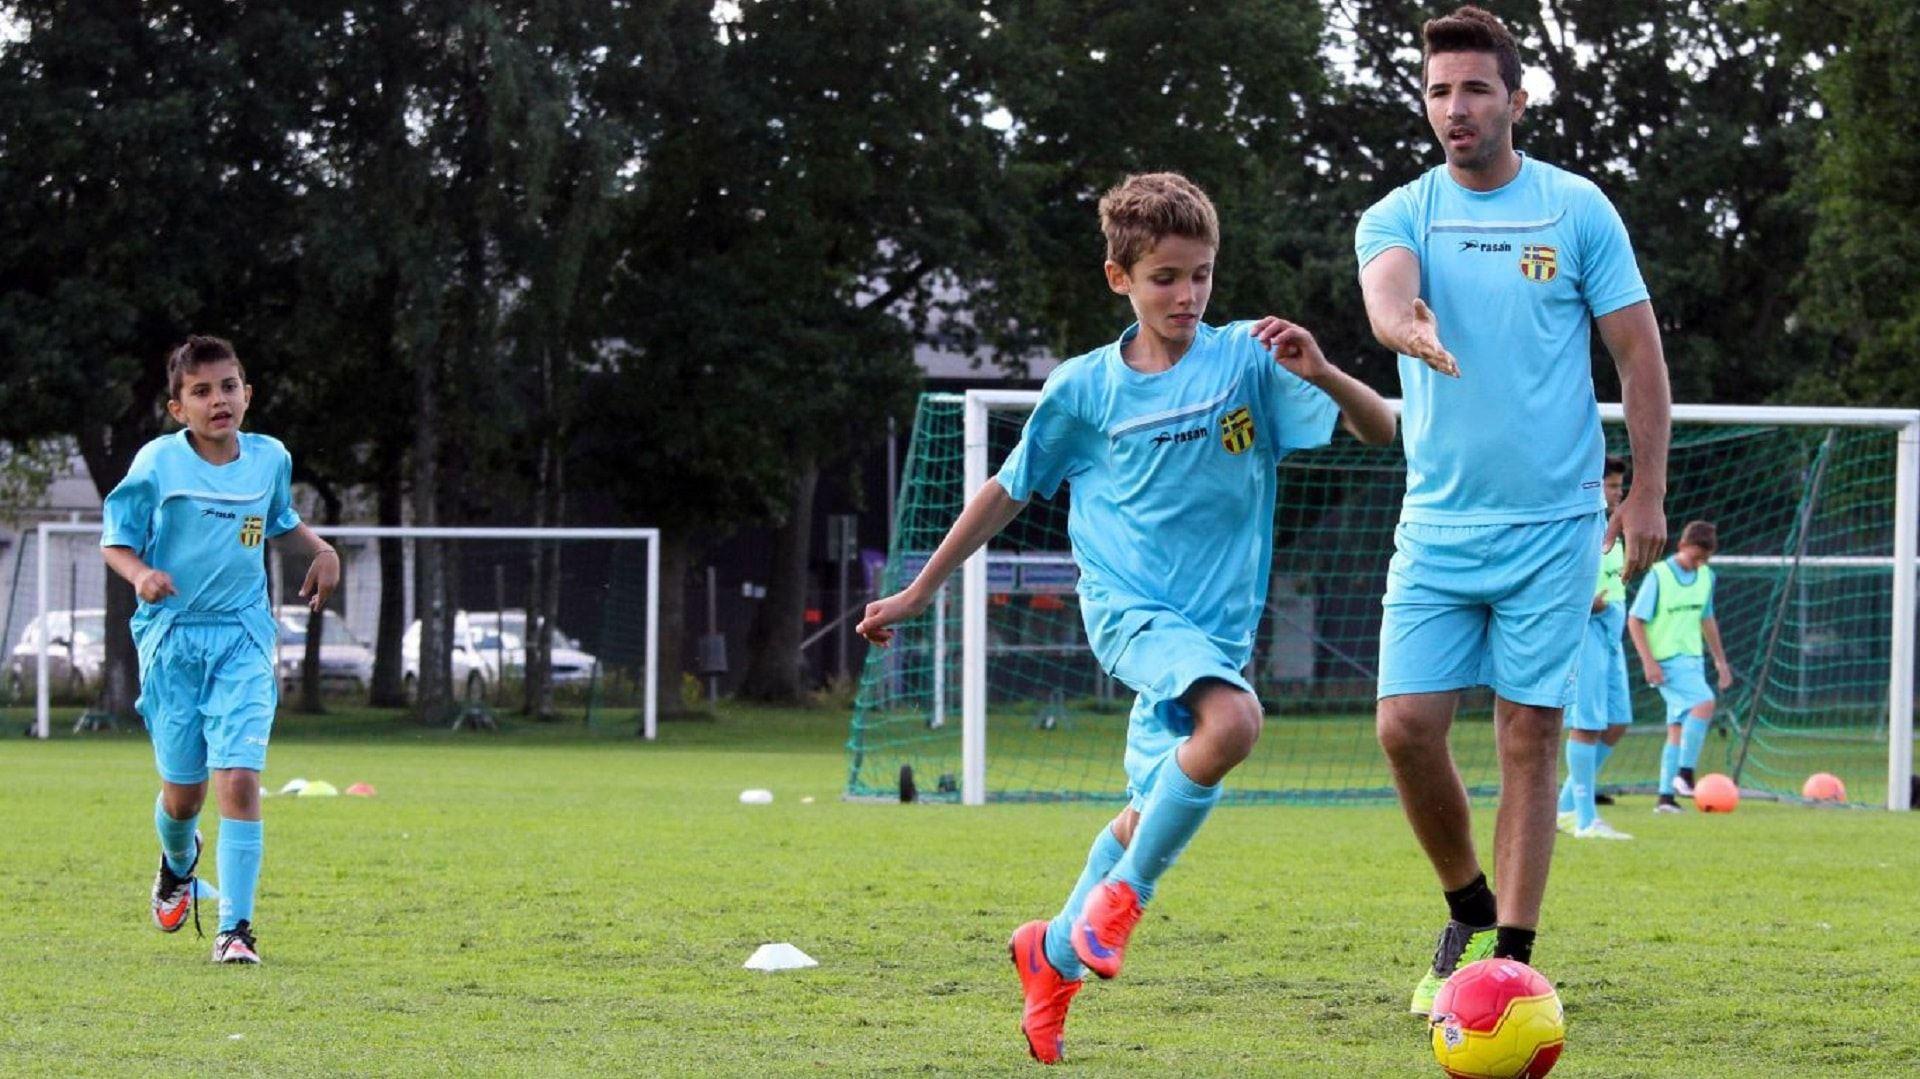 SAFF Camp – spansk fotbollsläger 3-7 juli